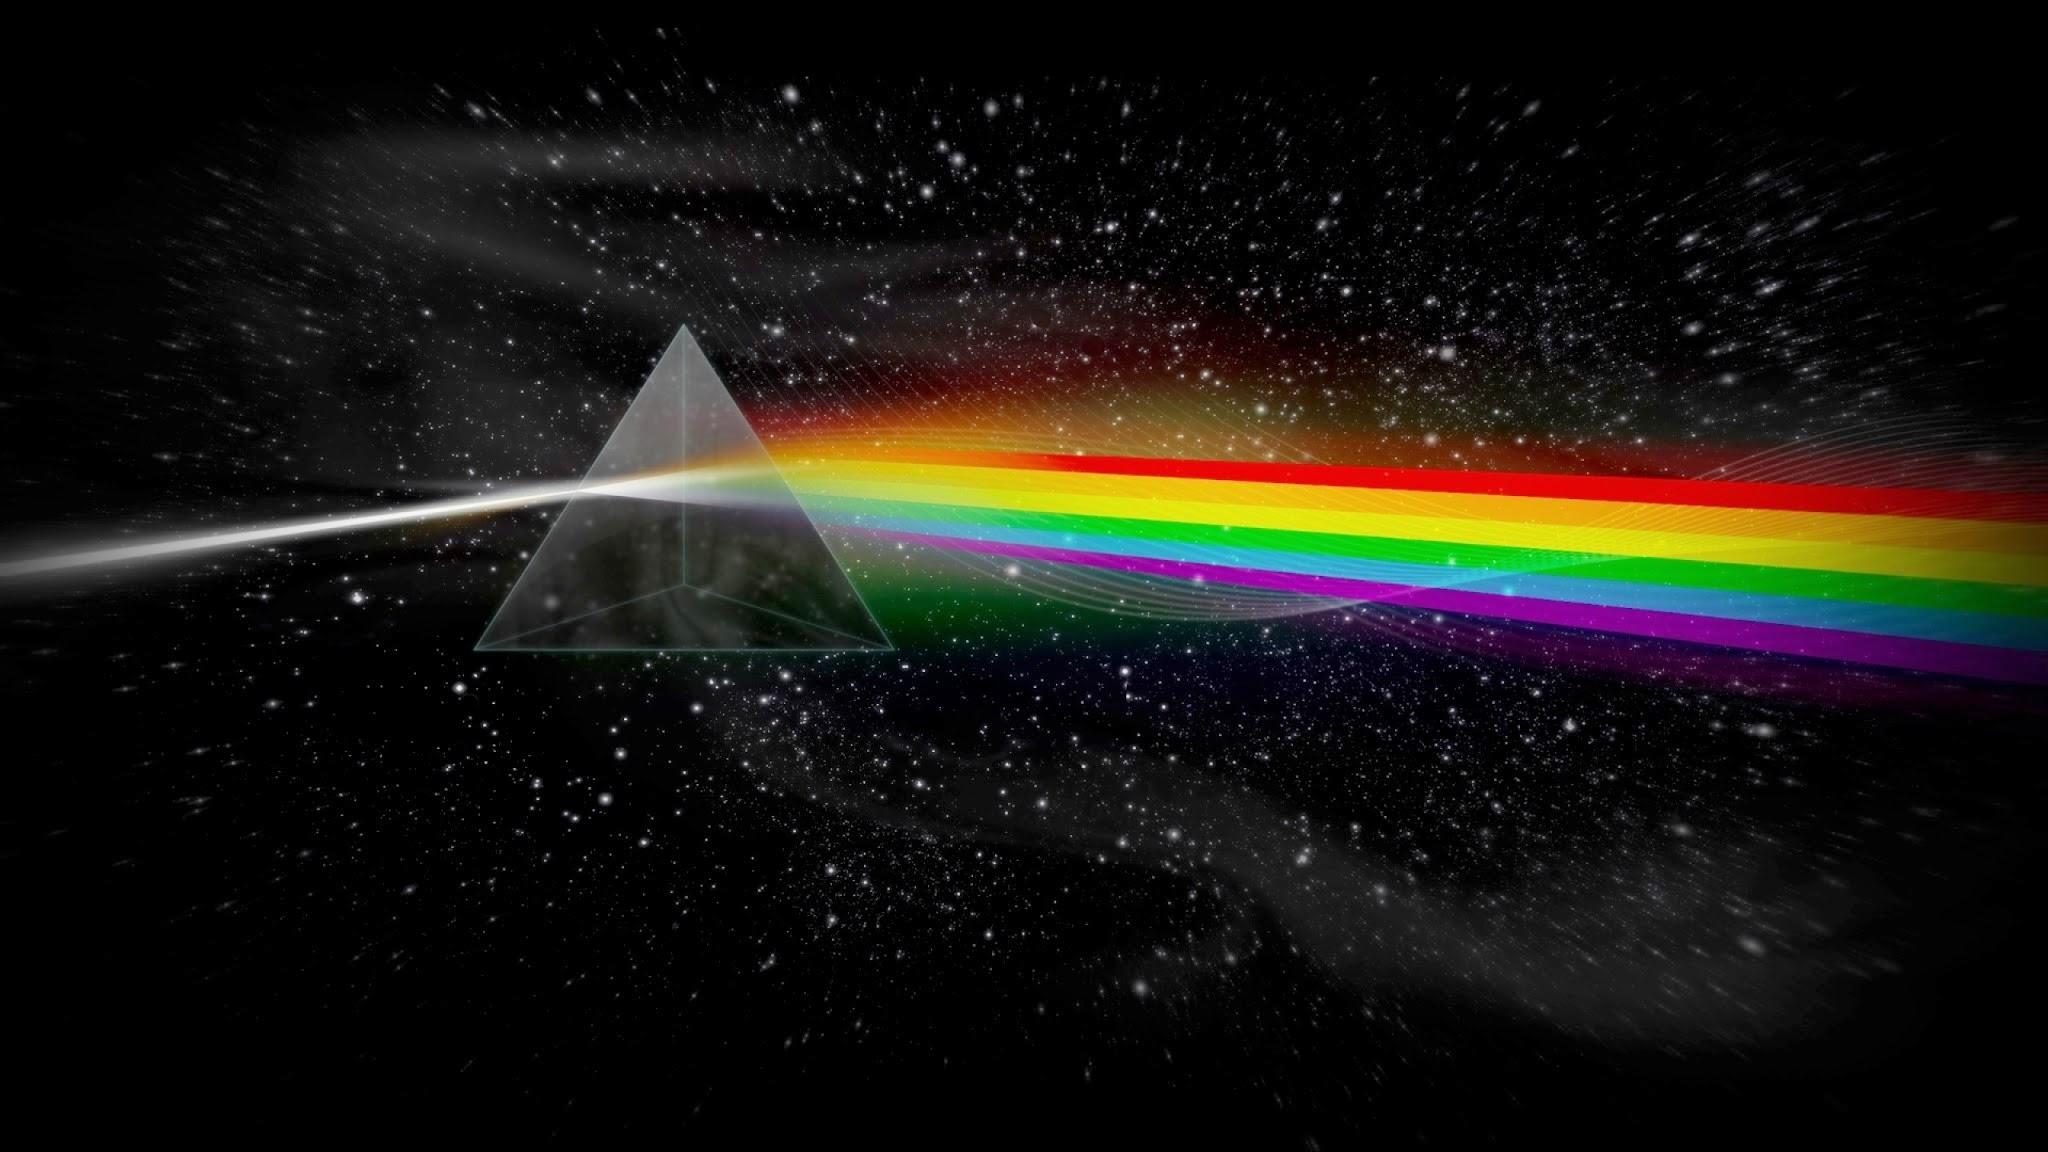 Free Download Pink Floyd Dark Side Of The Moon 1920x1080 Wallpaper